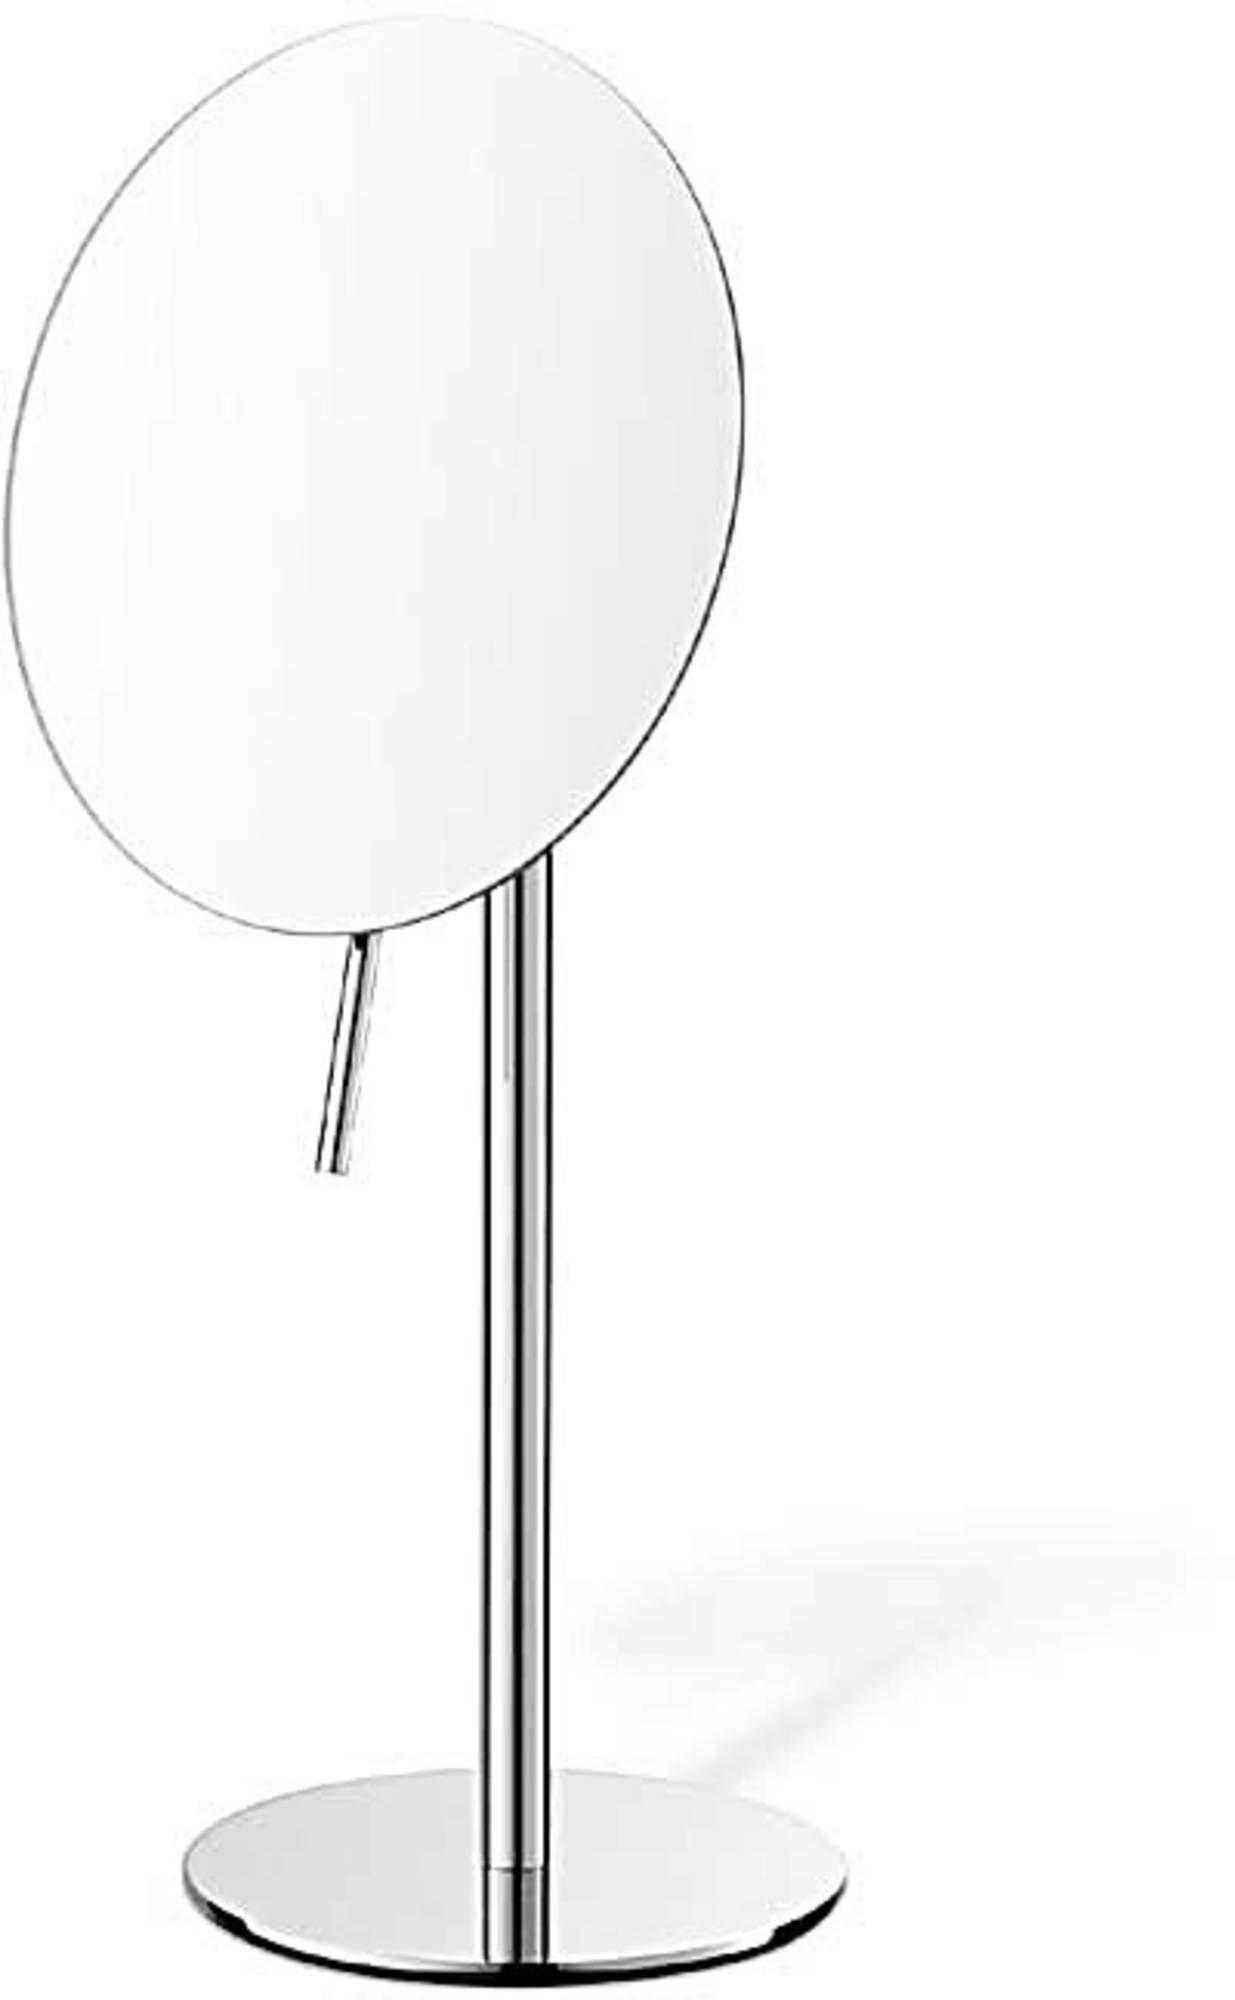 ZACK Avio Spiegel 33,5 cm